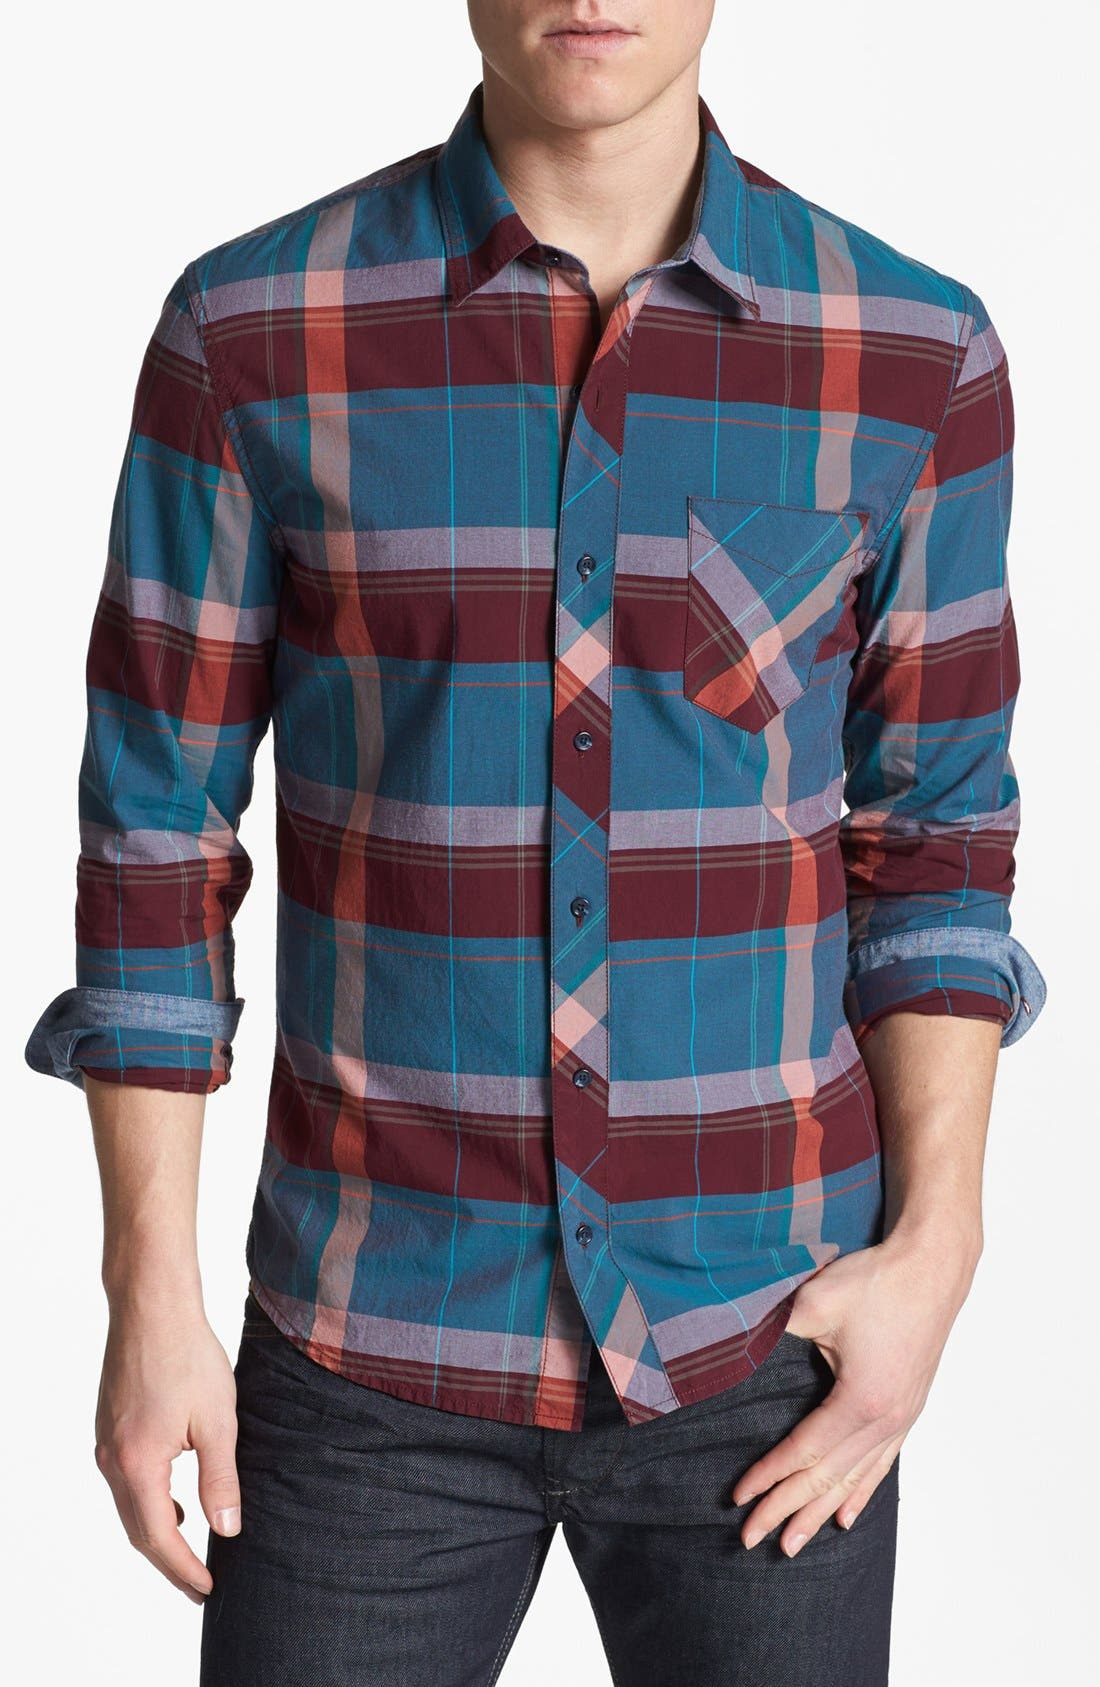 Alternate Image 1 Selected - 1901 Trim Fit Plaid Poplin Shirt